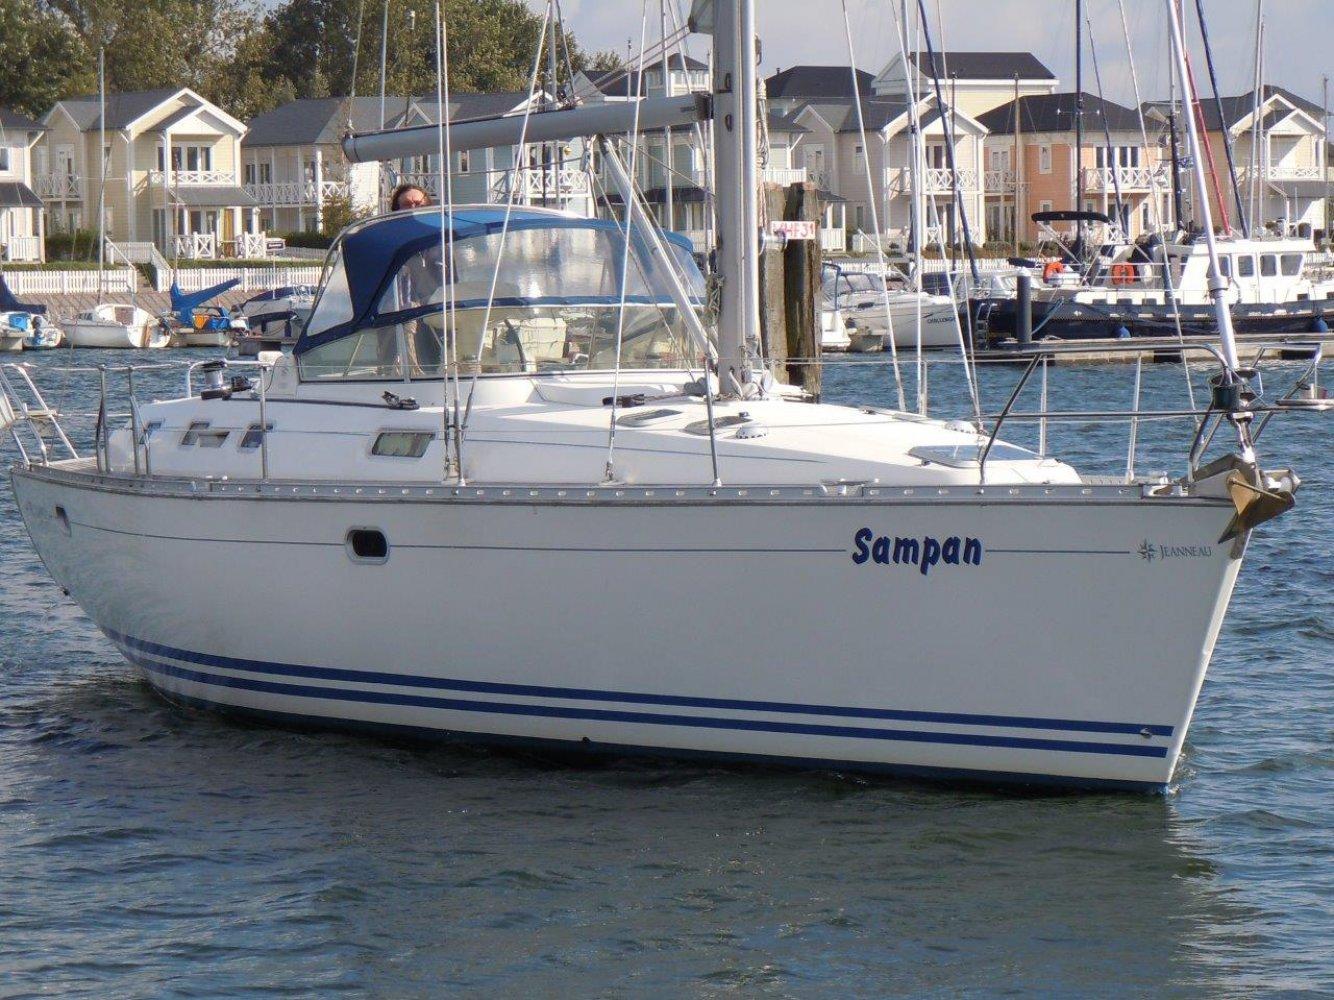 Jeanneau Sun Odyssey 42 CC sailboat for sale | White Whale